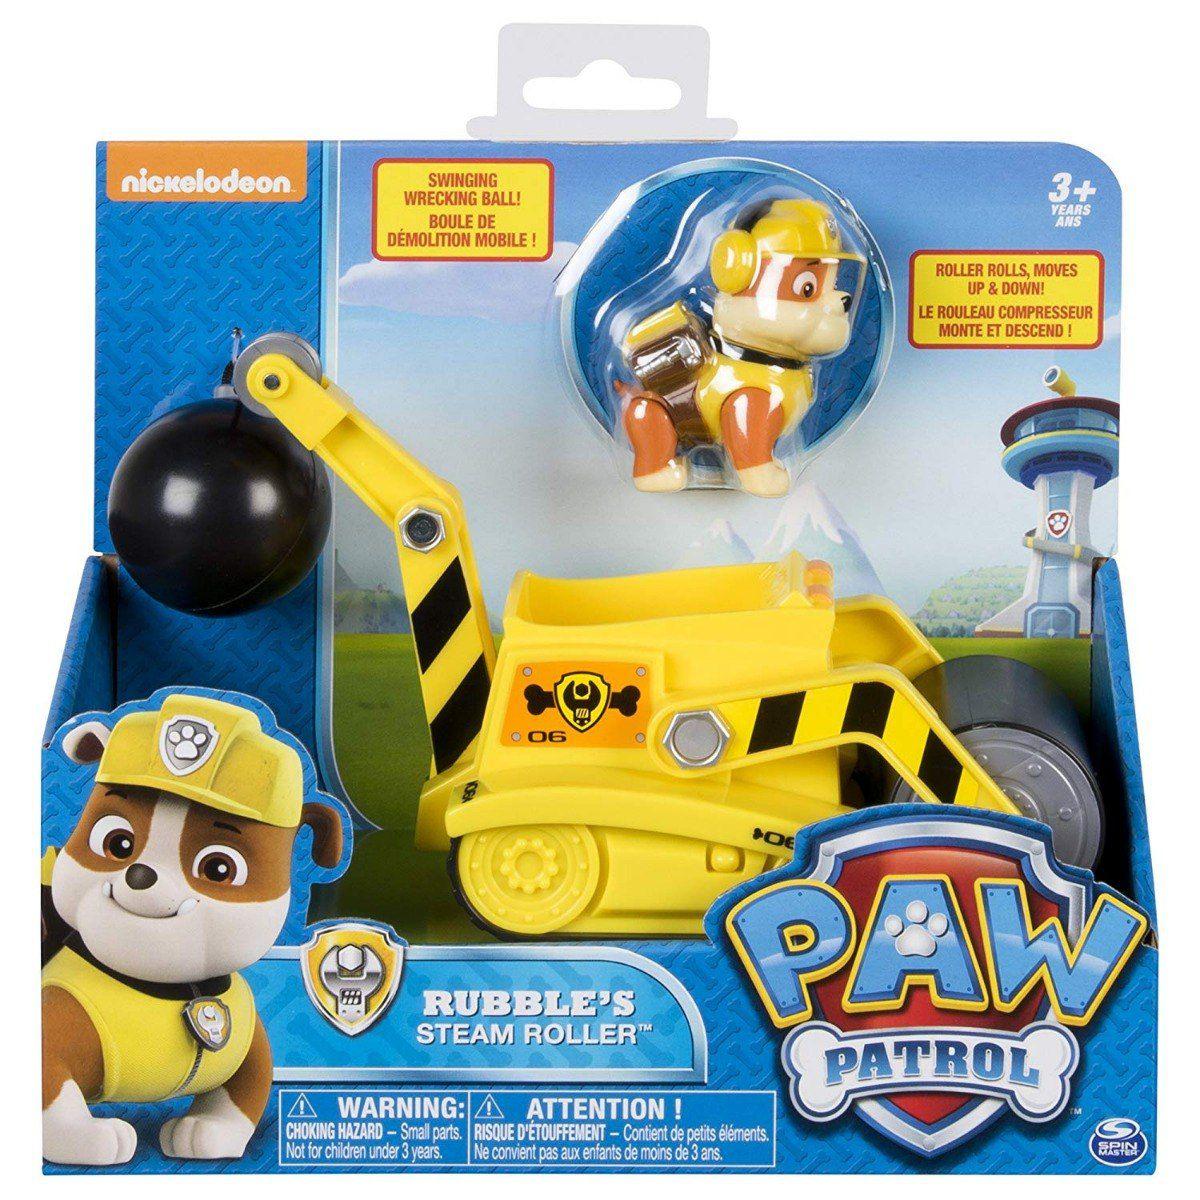 Carrinho Patrulha Canina com Rubble Steam Roller 1302 Sunny